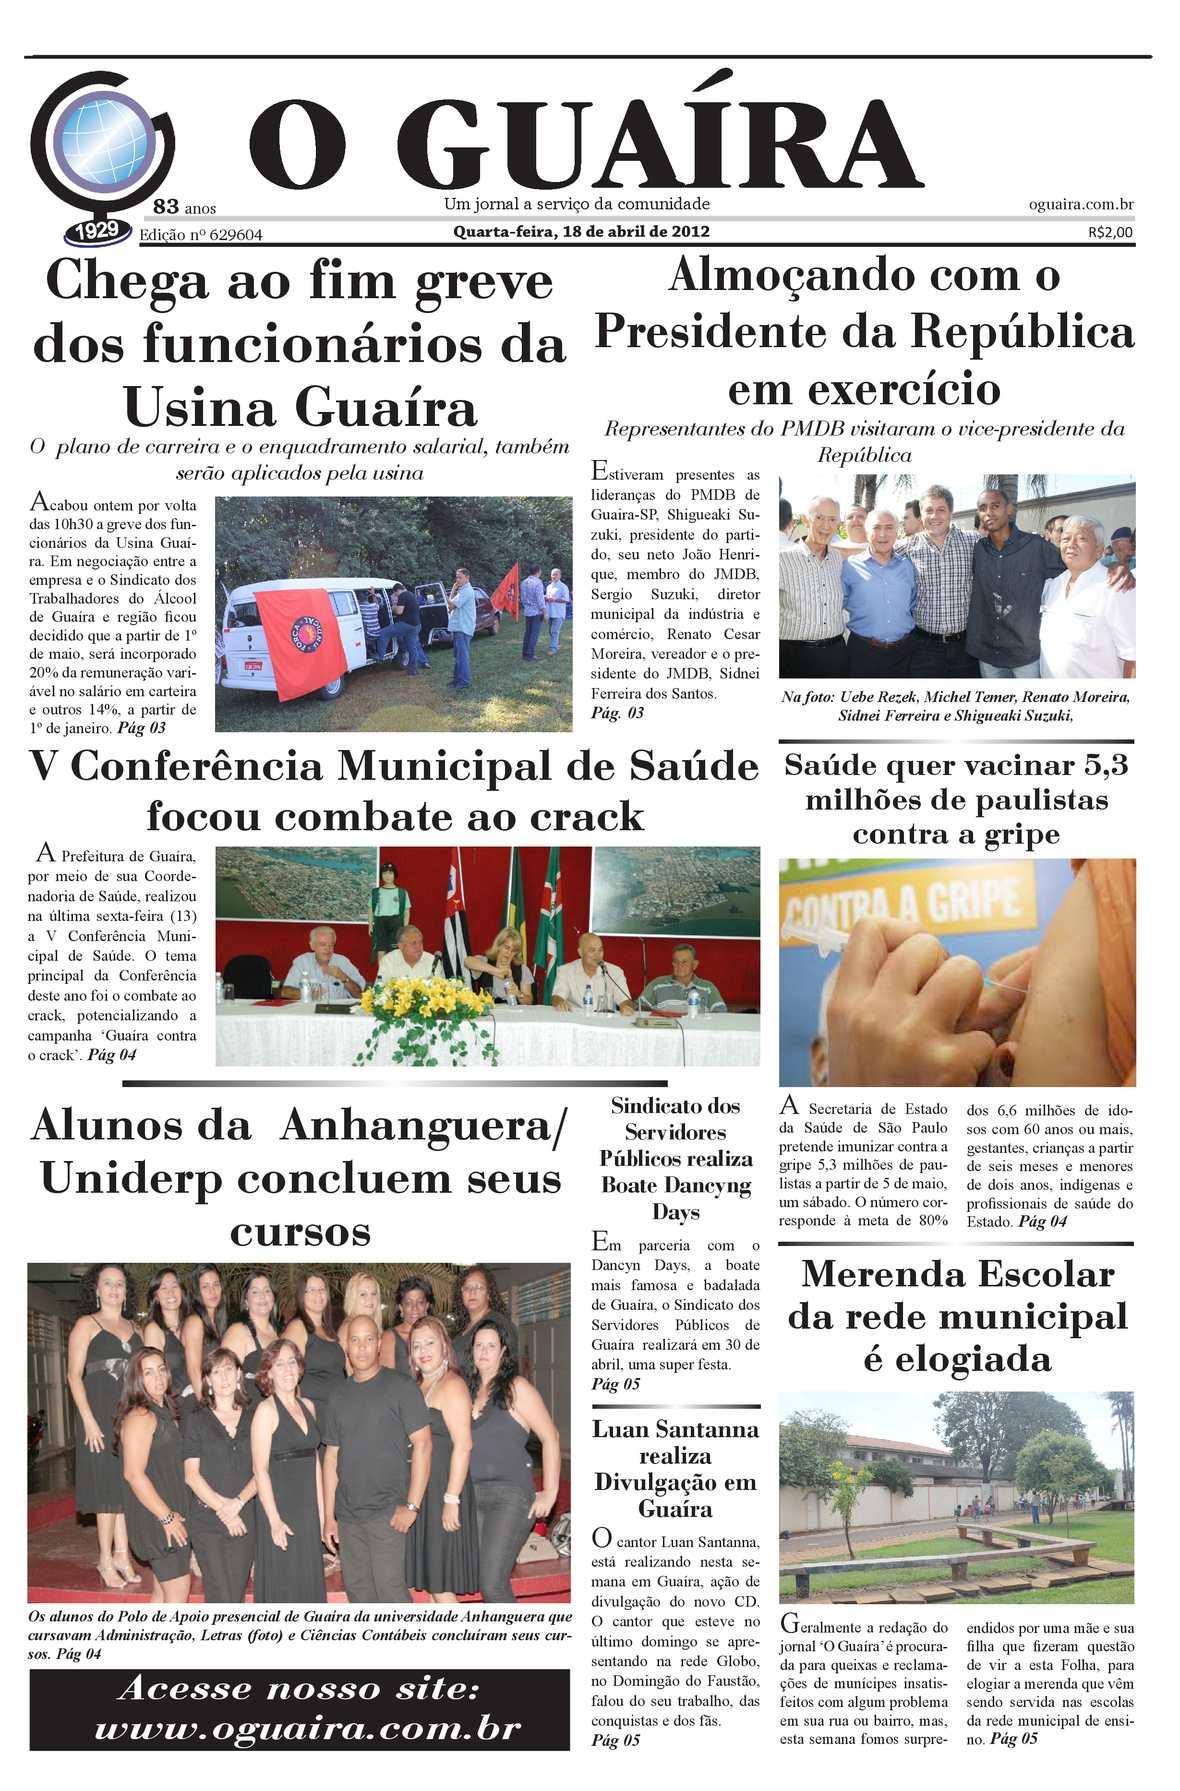 538fa331c083d Calaméo - jornal o guaira 18 04 2012